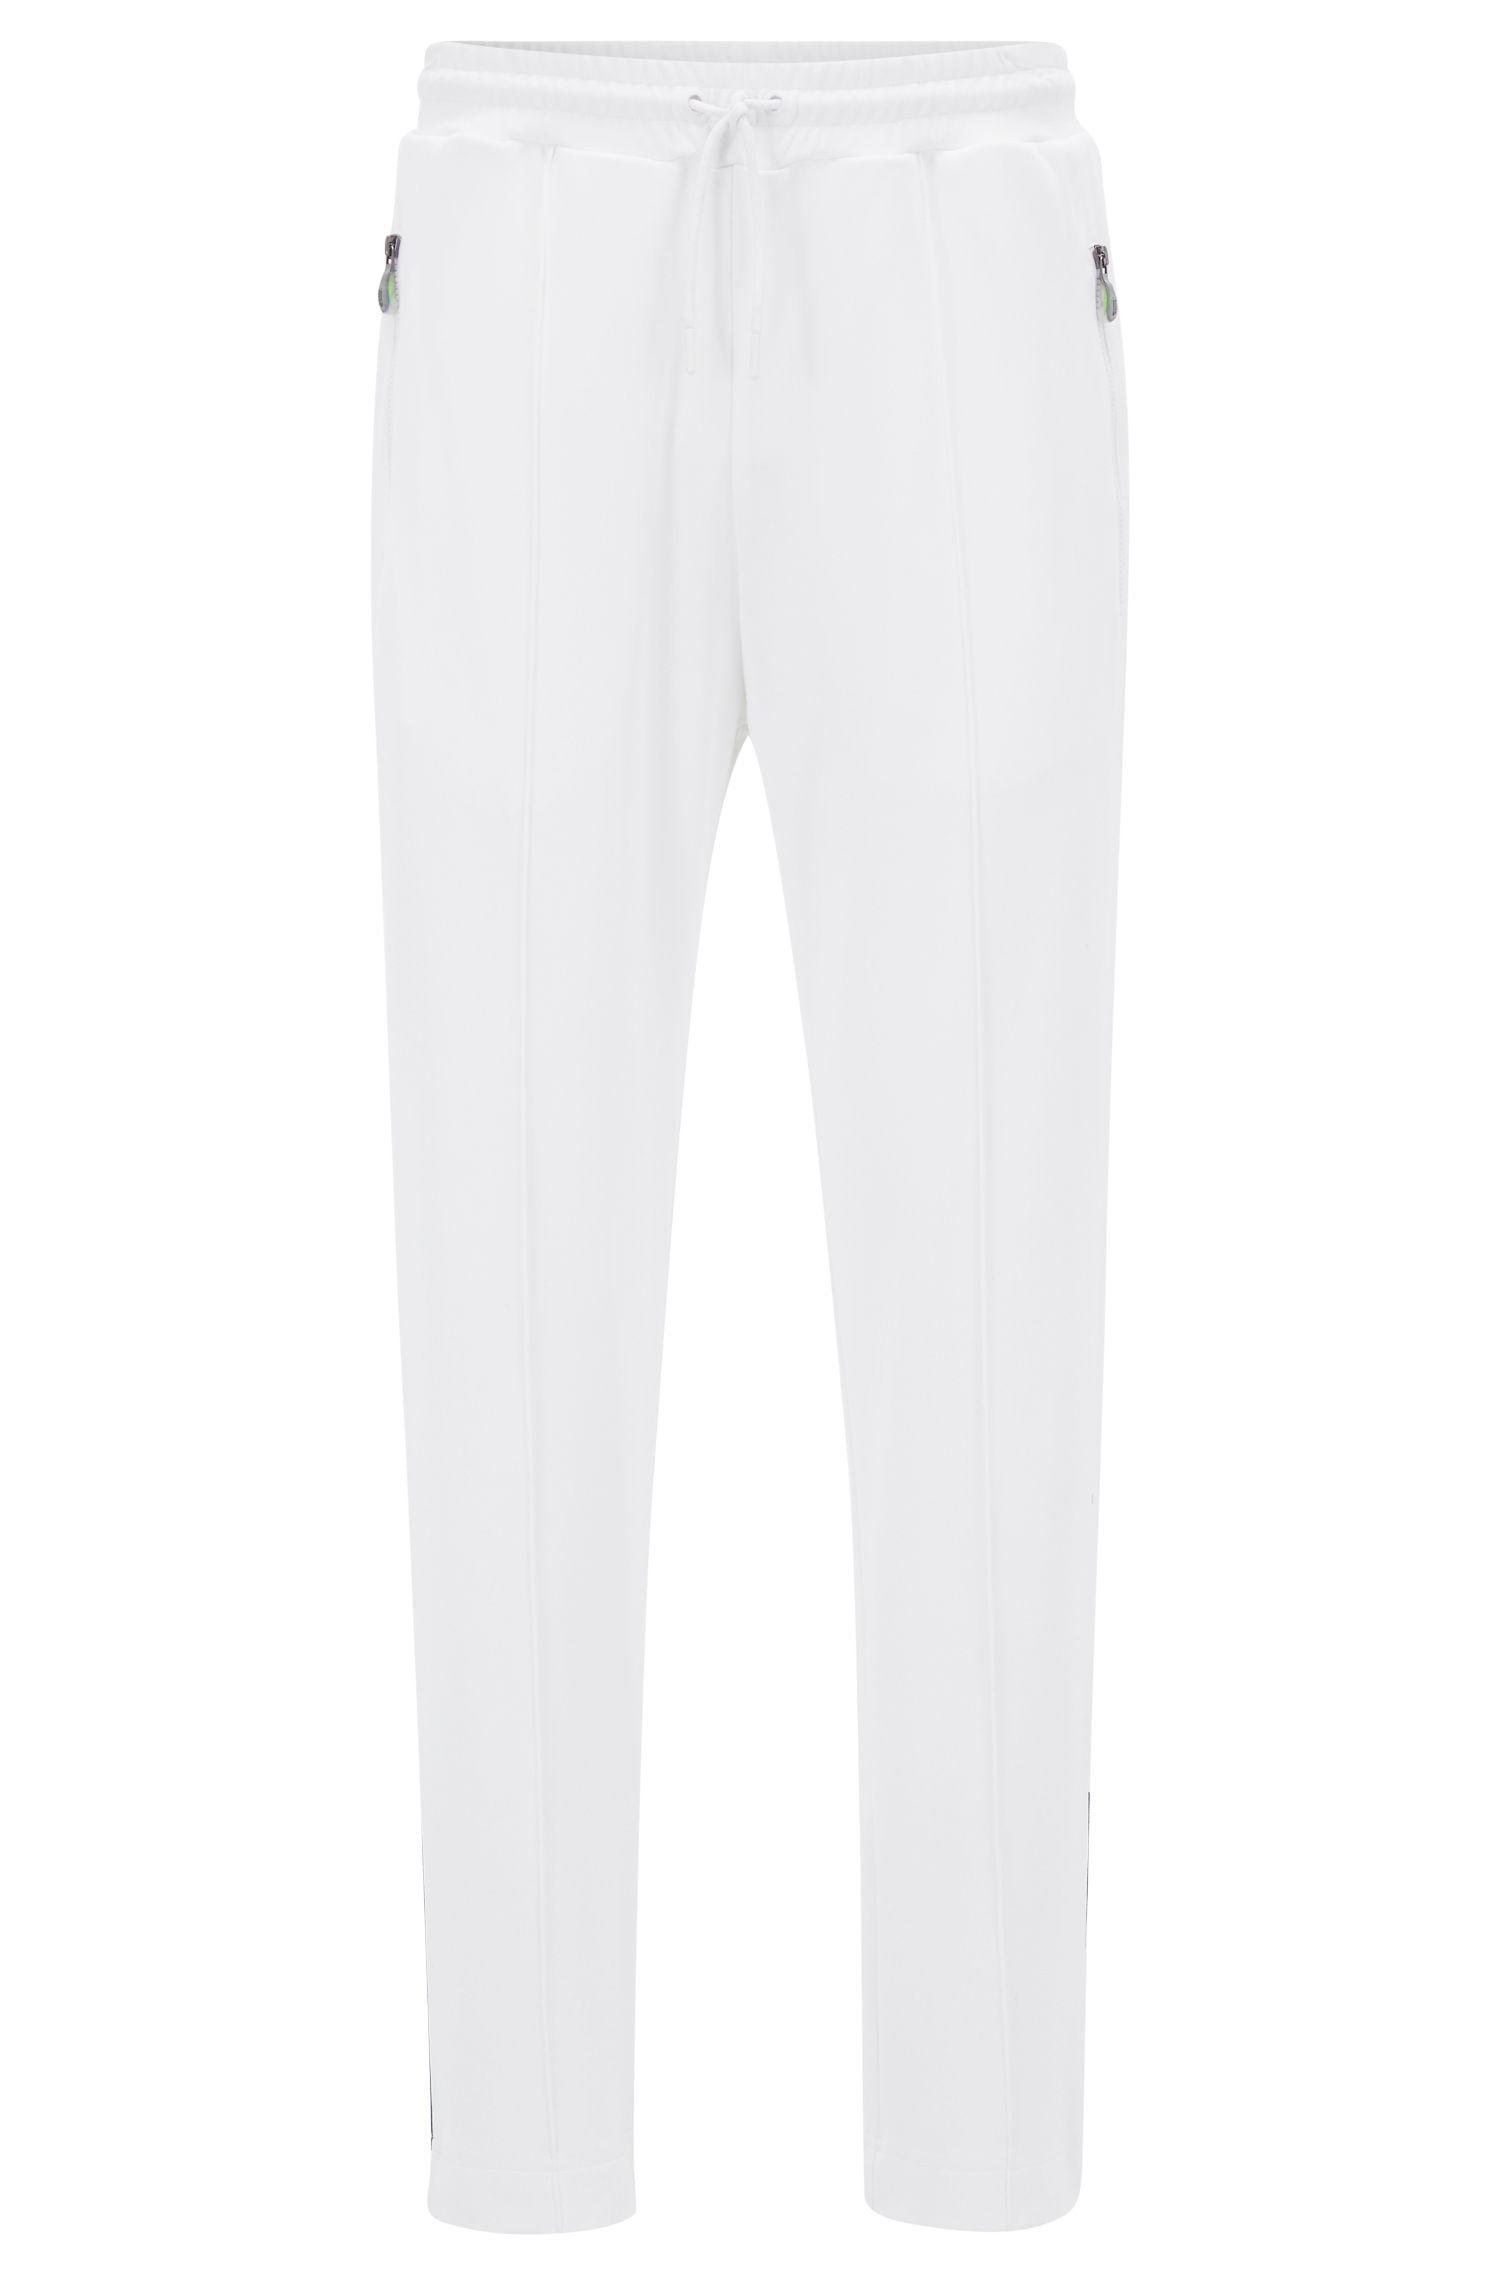 Interlock Piqué Track Pant | Hurl , White